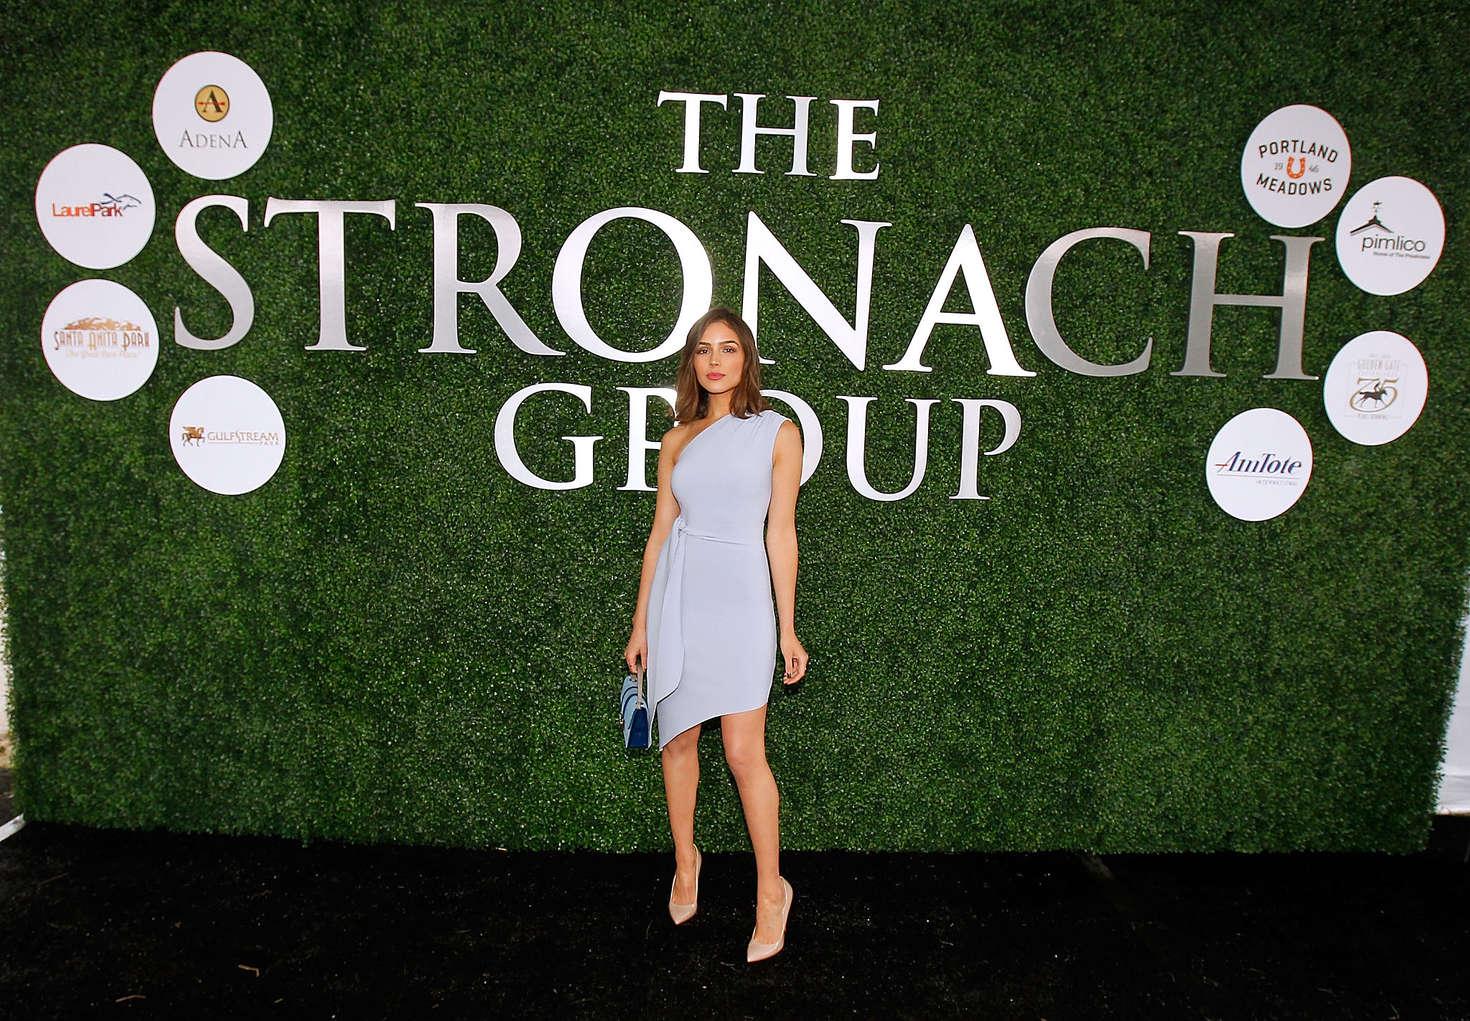 Stronach Group